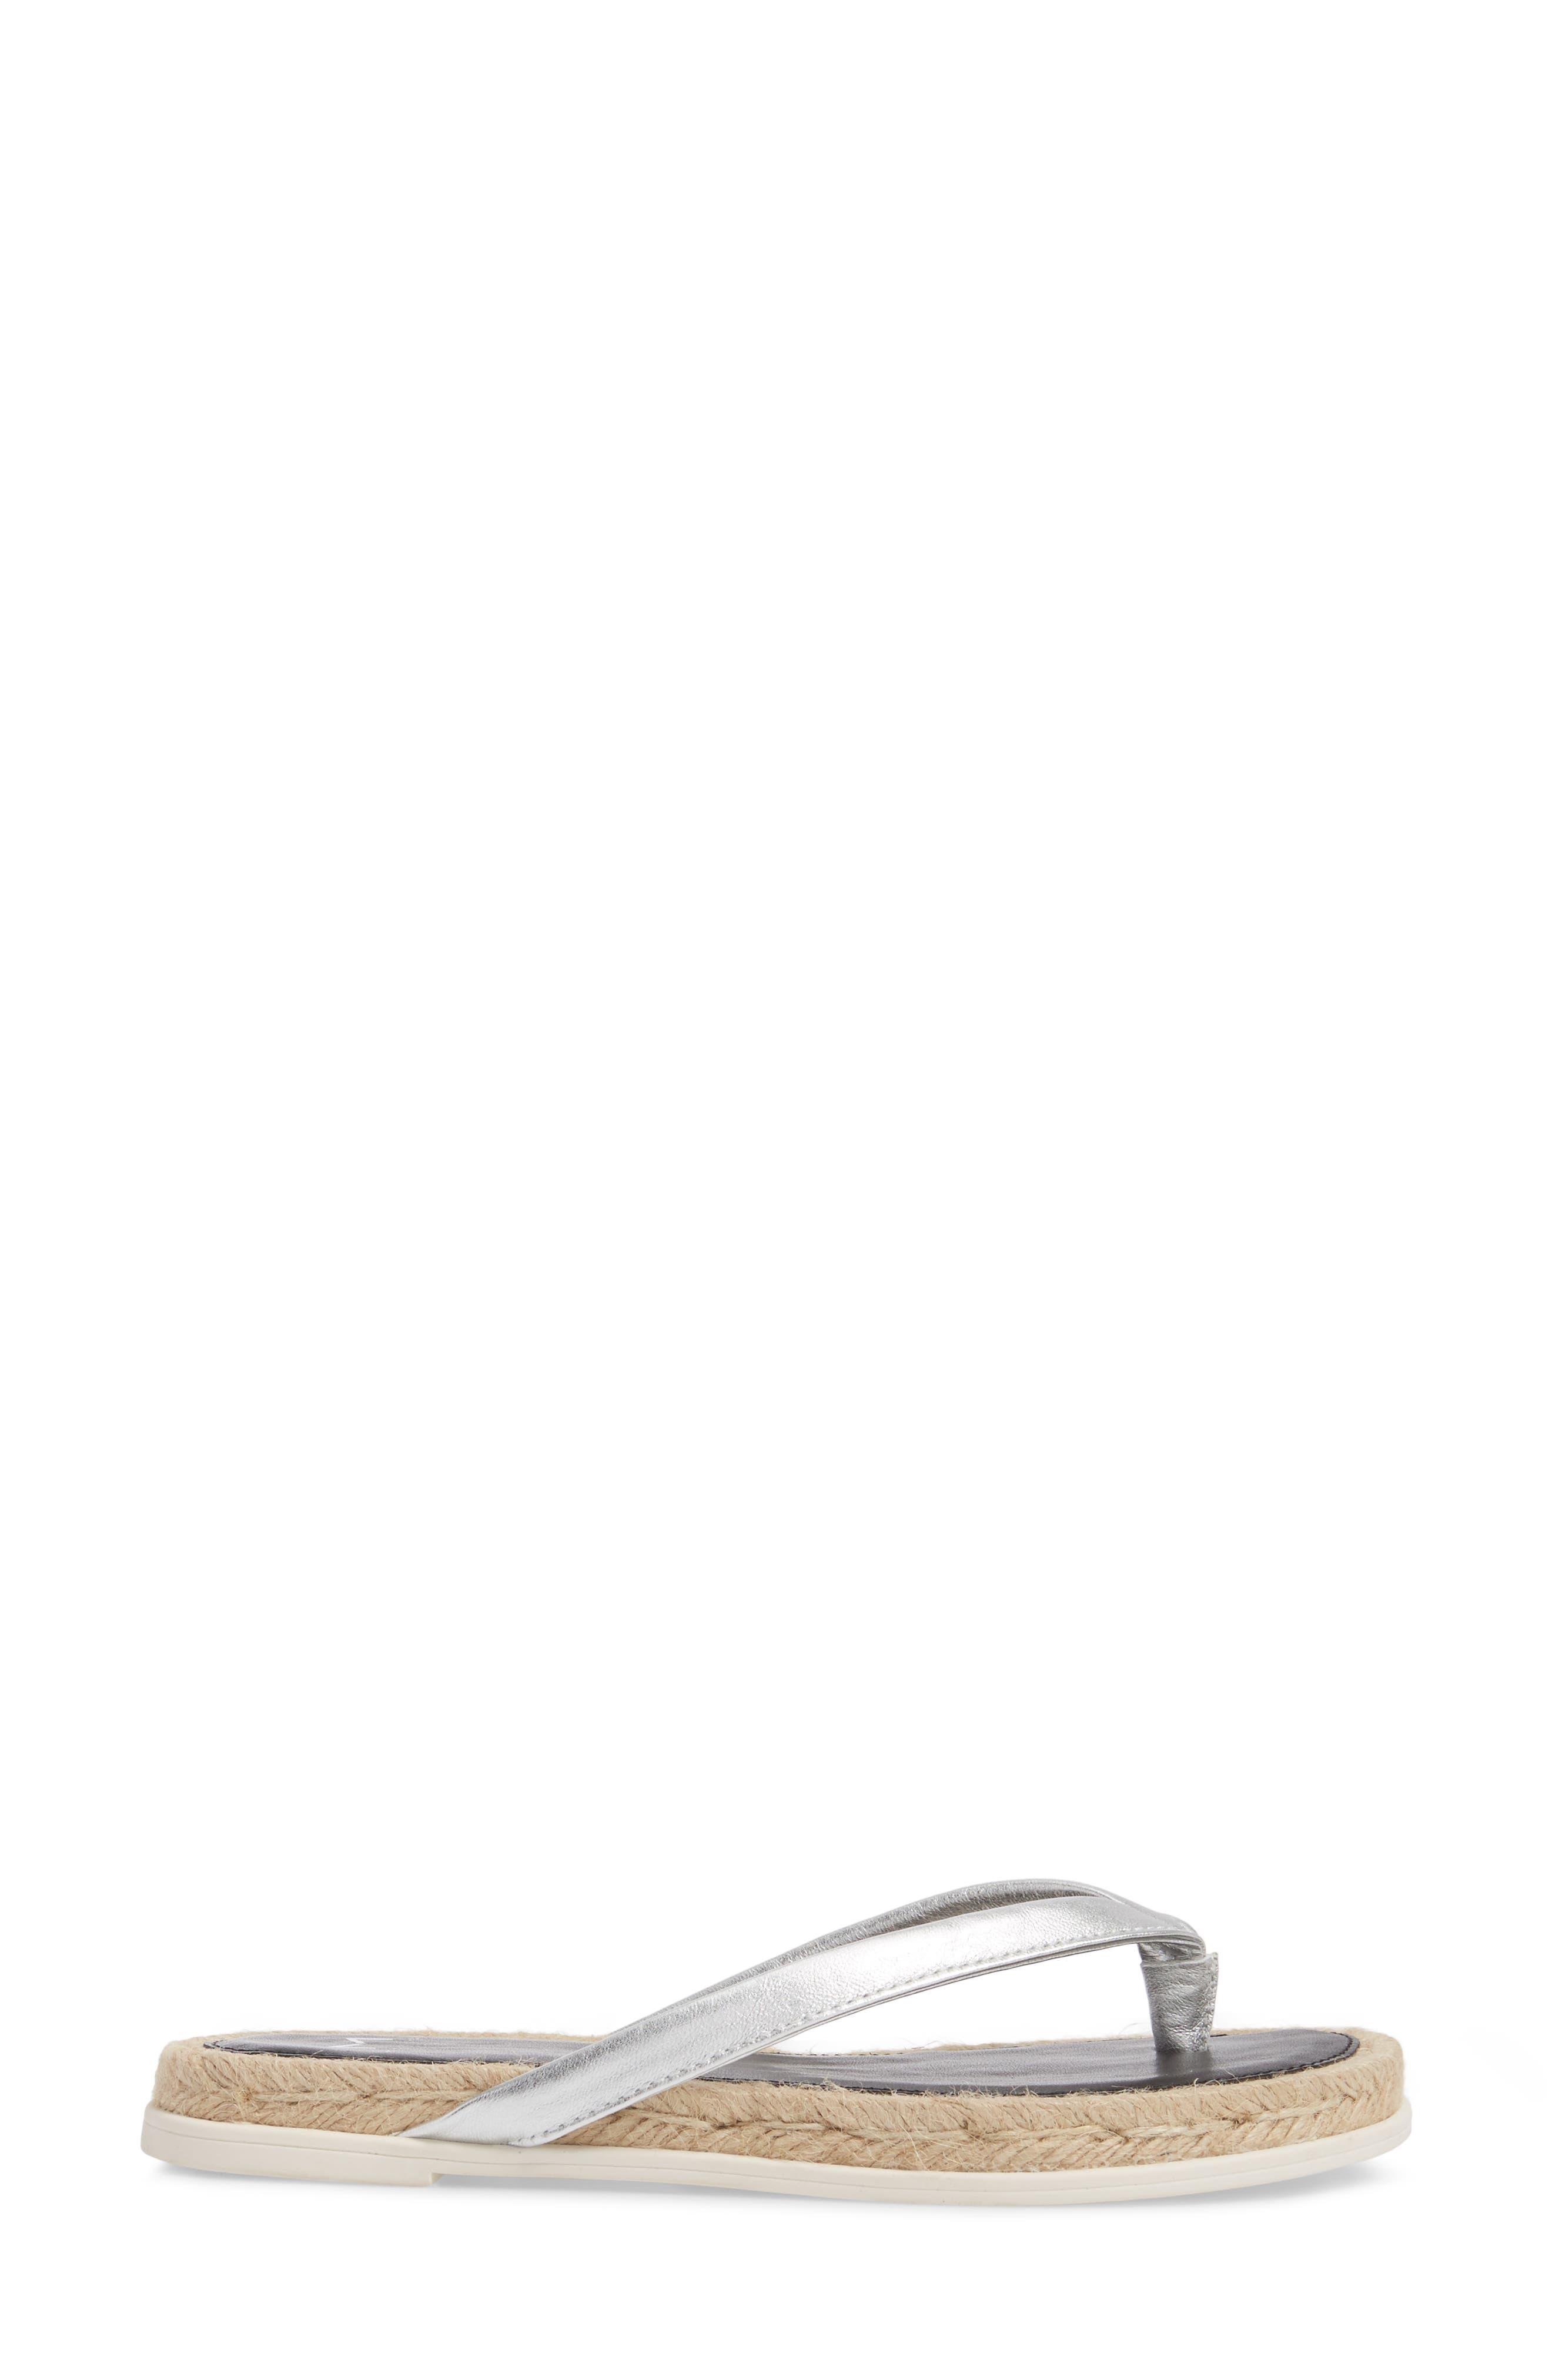 Utah Espadrille Sandal,                             Alternate thumbnail 8, color,